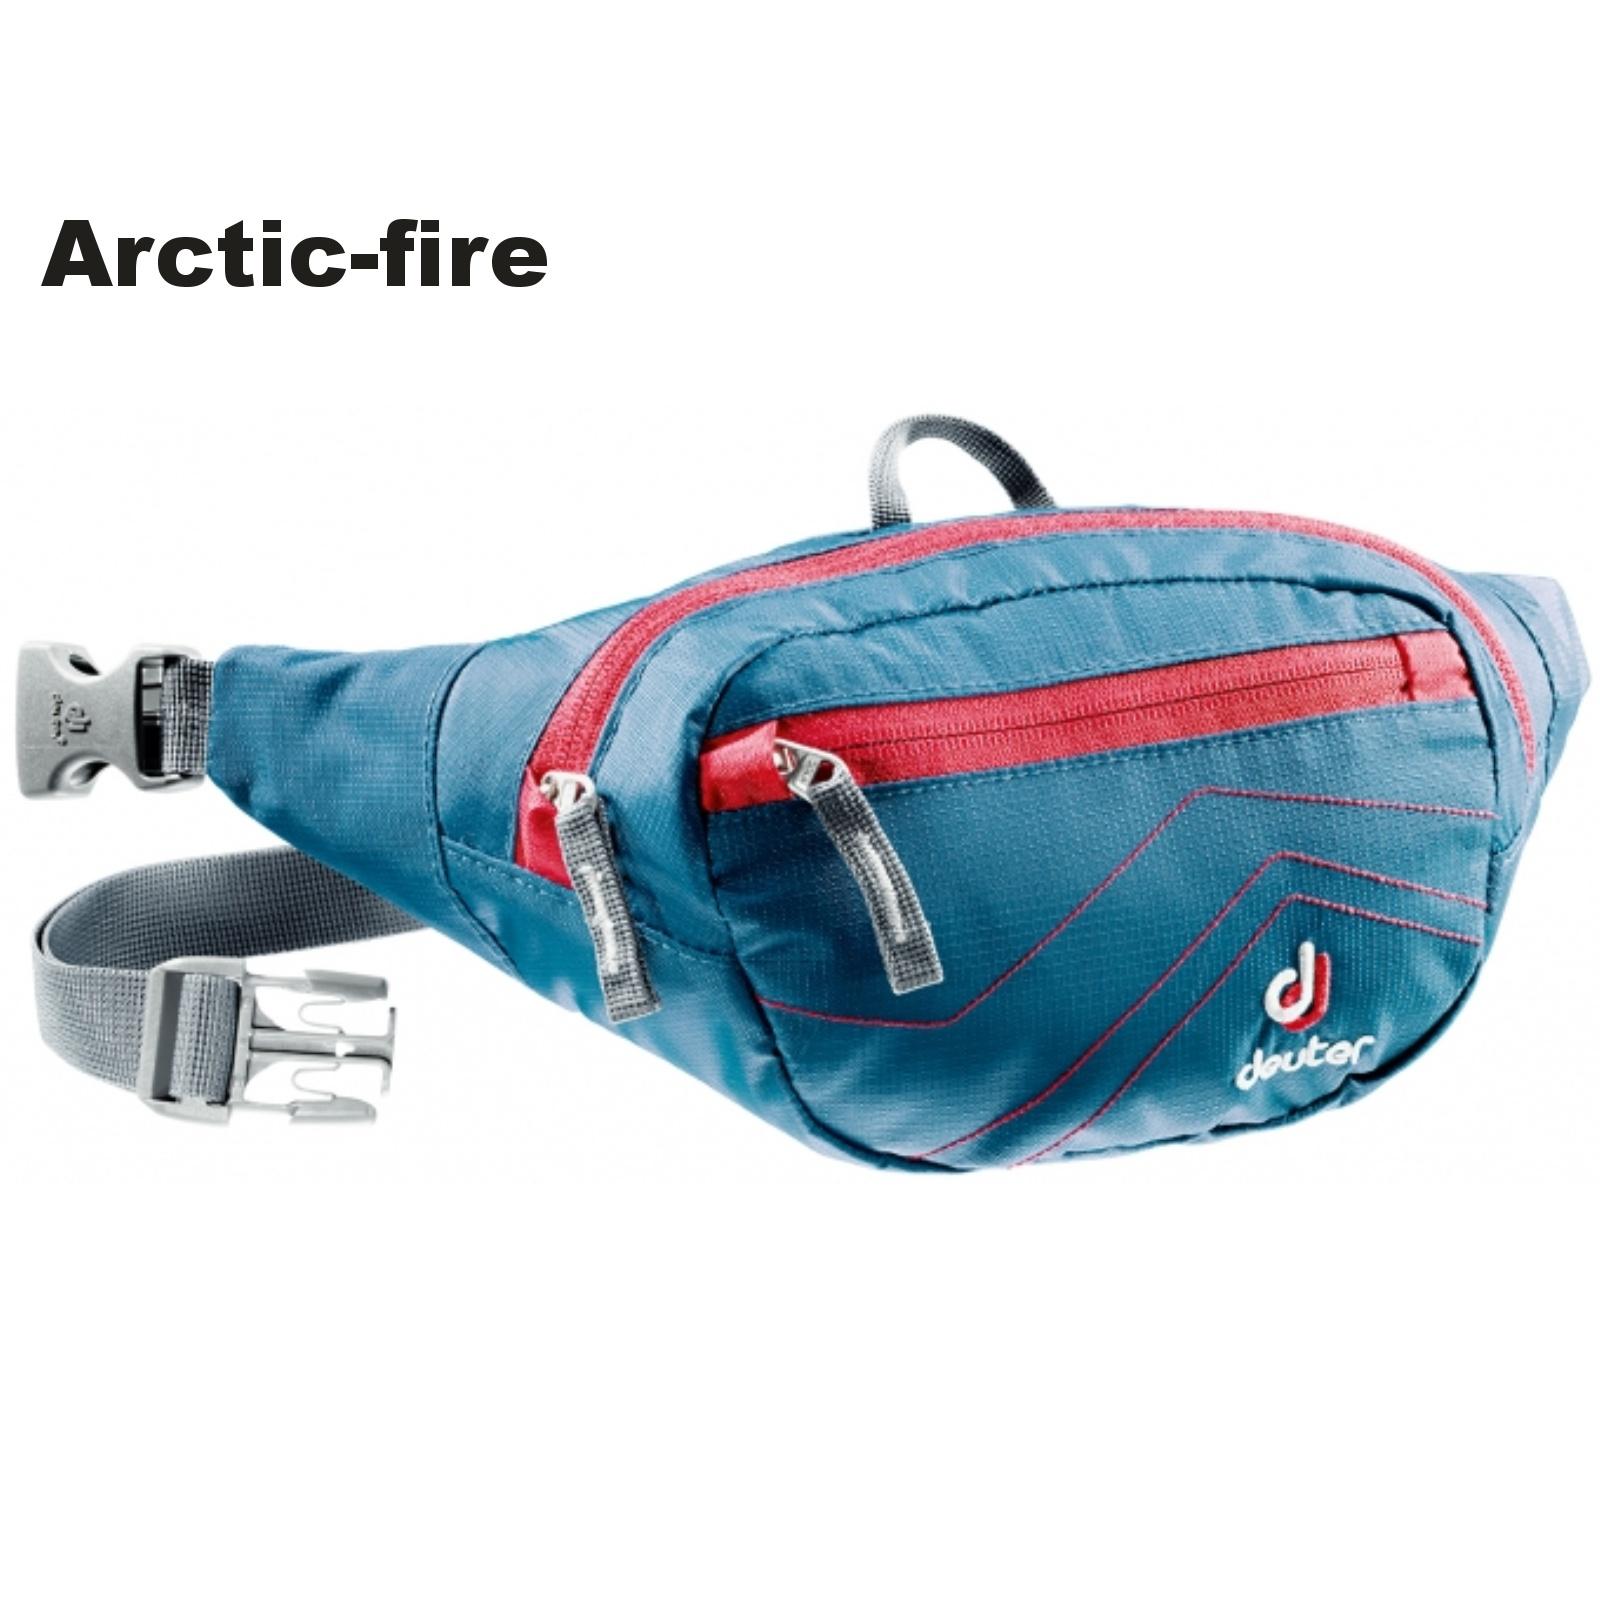 Ľadvinka DEUTER Belt I - arctic-fire